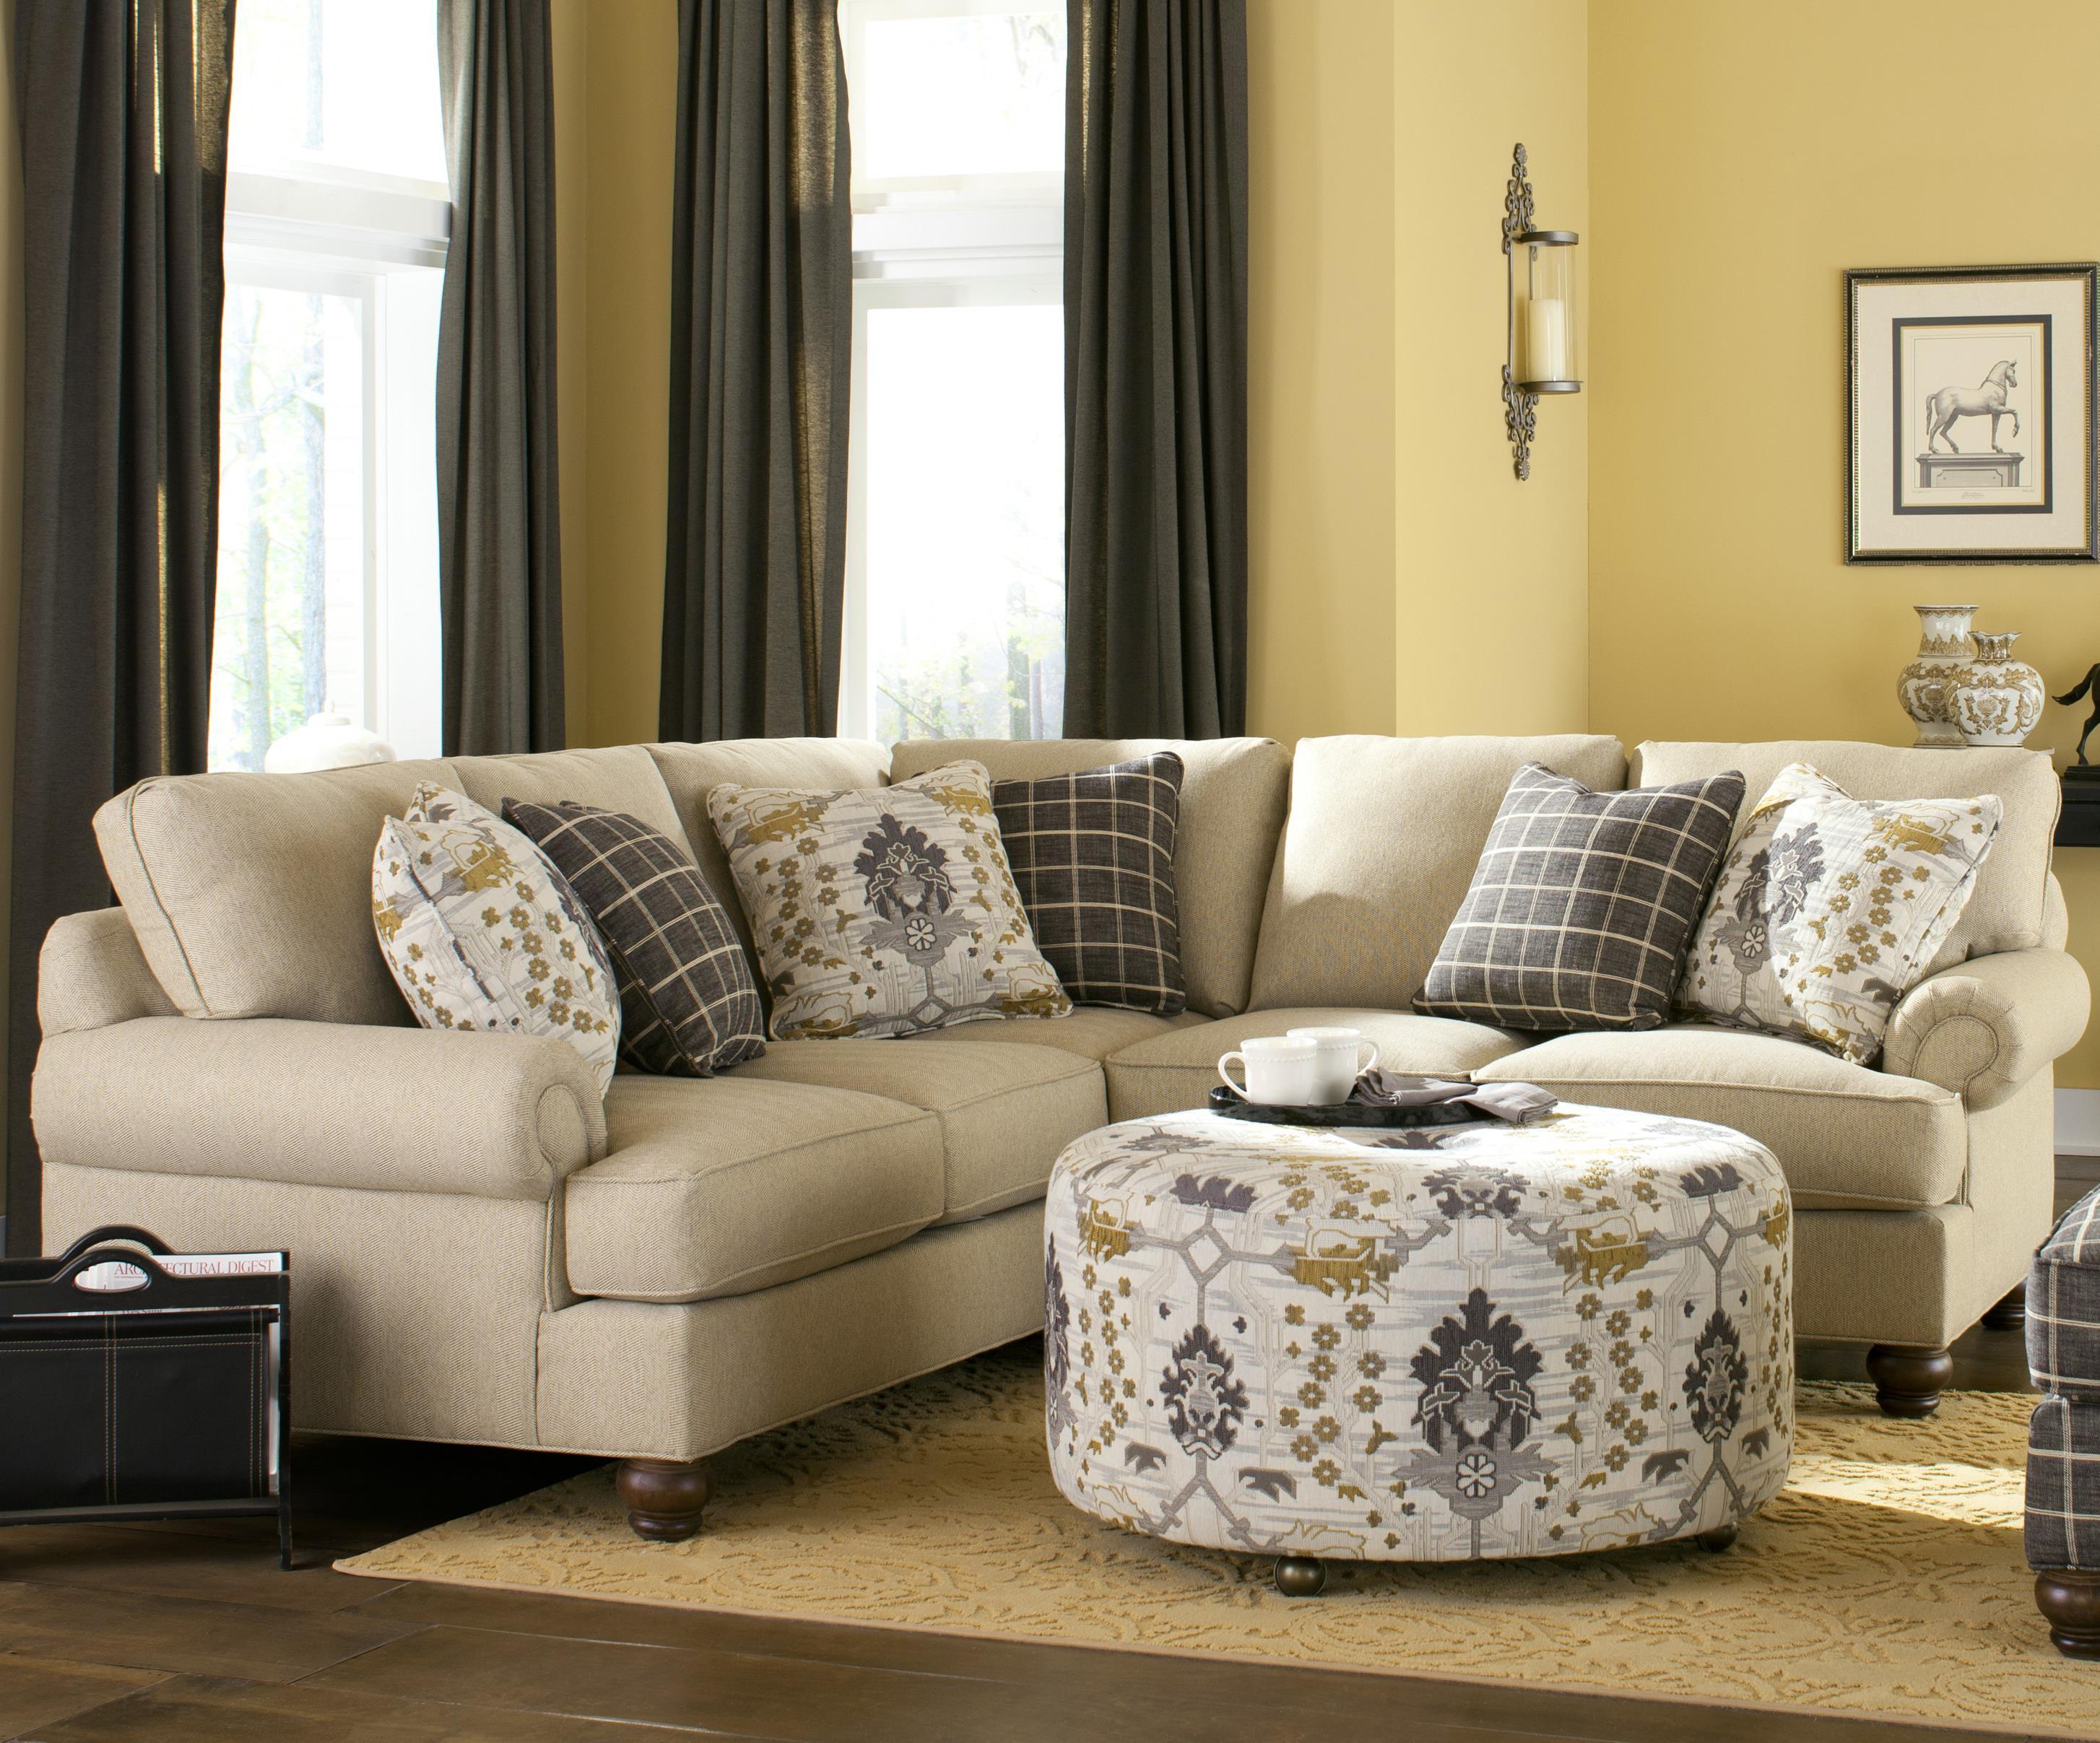 Attirant Craftmaster C9 Custom Collectionu003cbu003eCustomu003c/bu003e 2 Pc Sectional Sofa